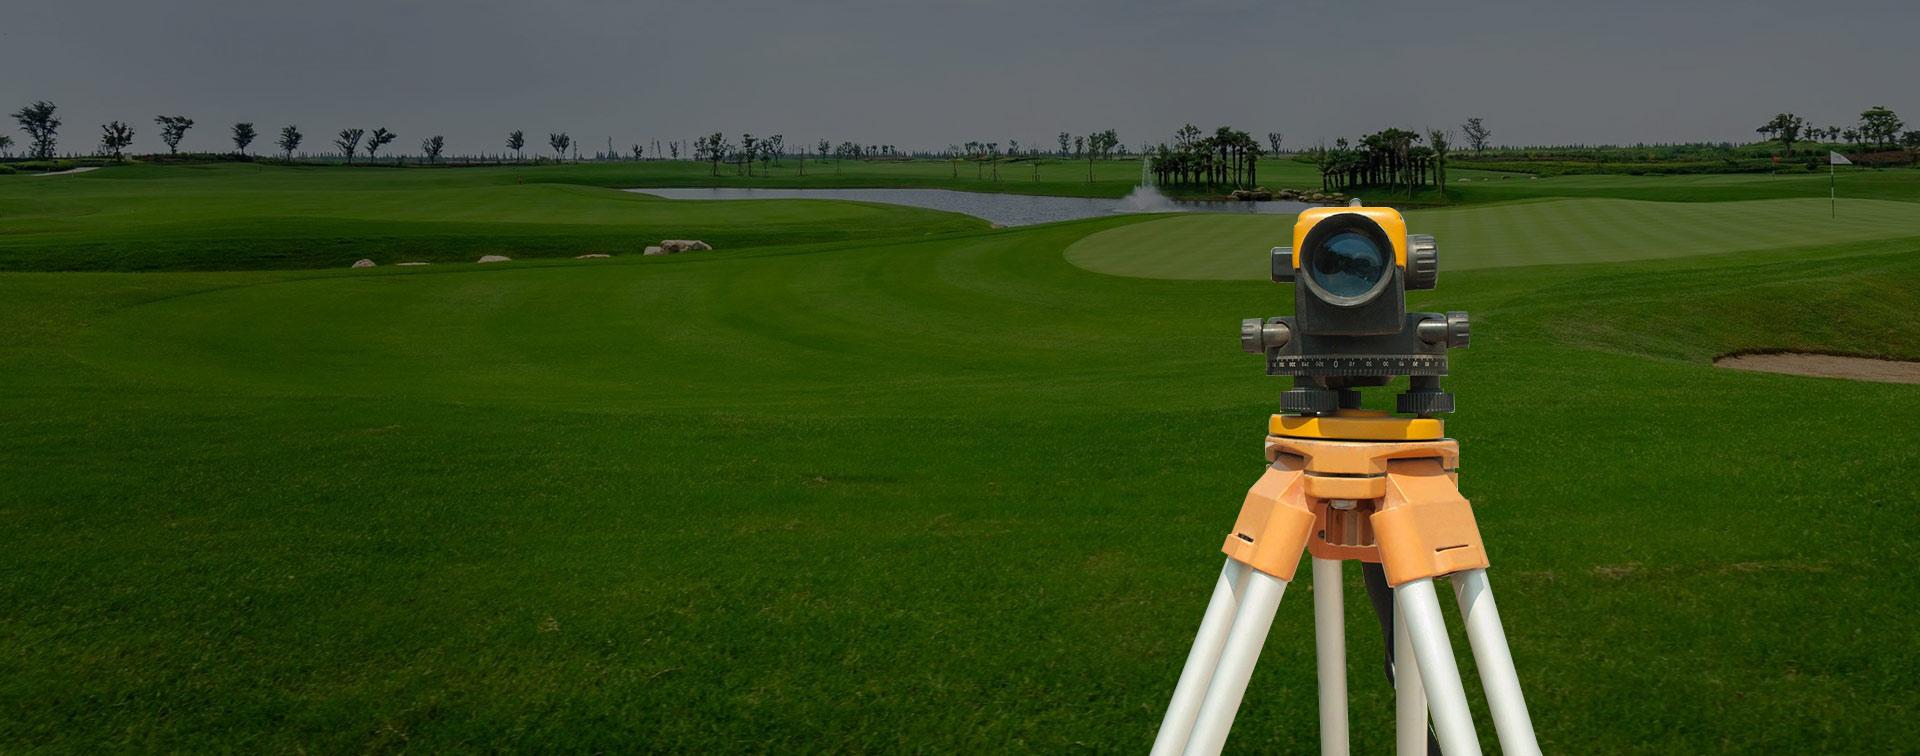 Bradley Cox And Associates Land Surveying